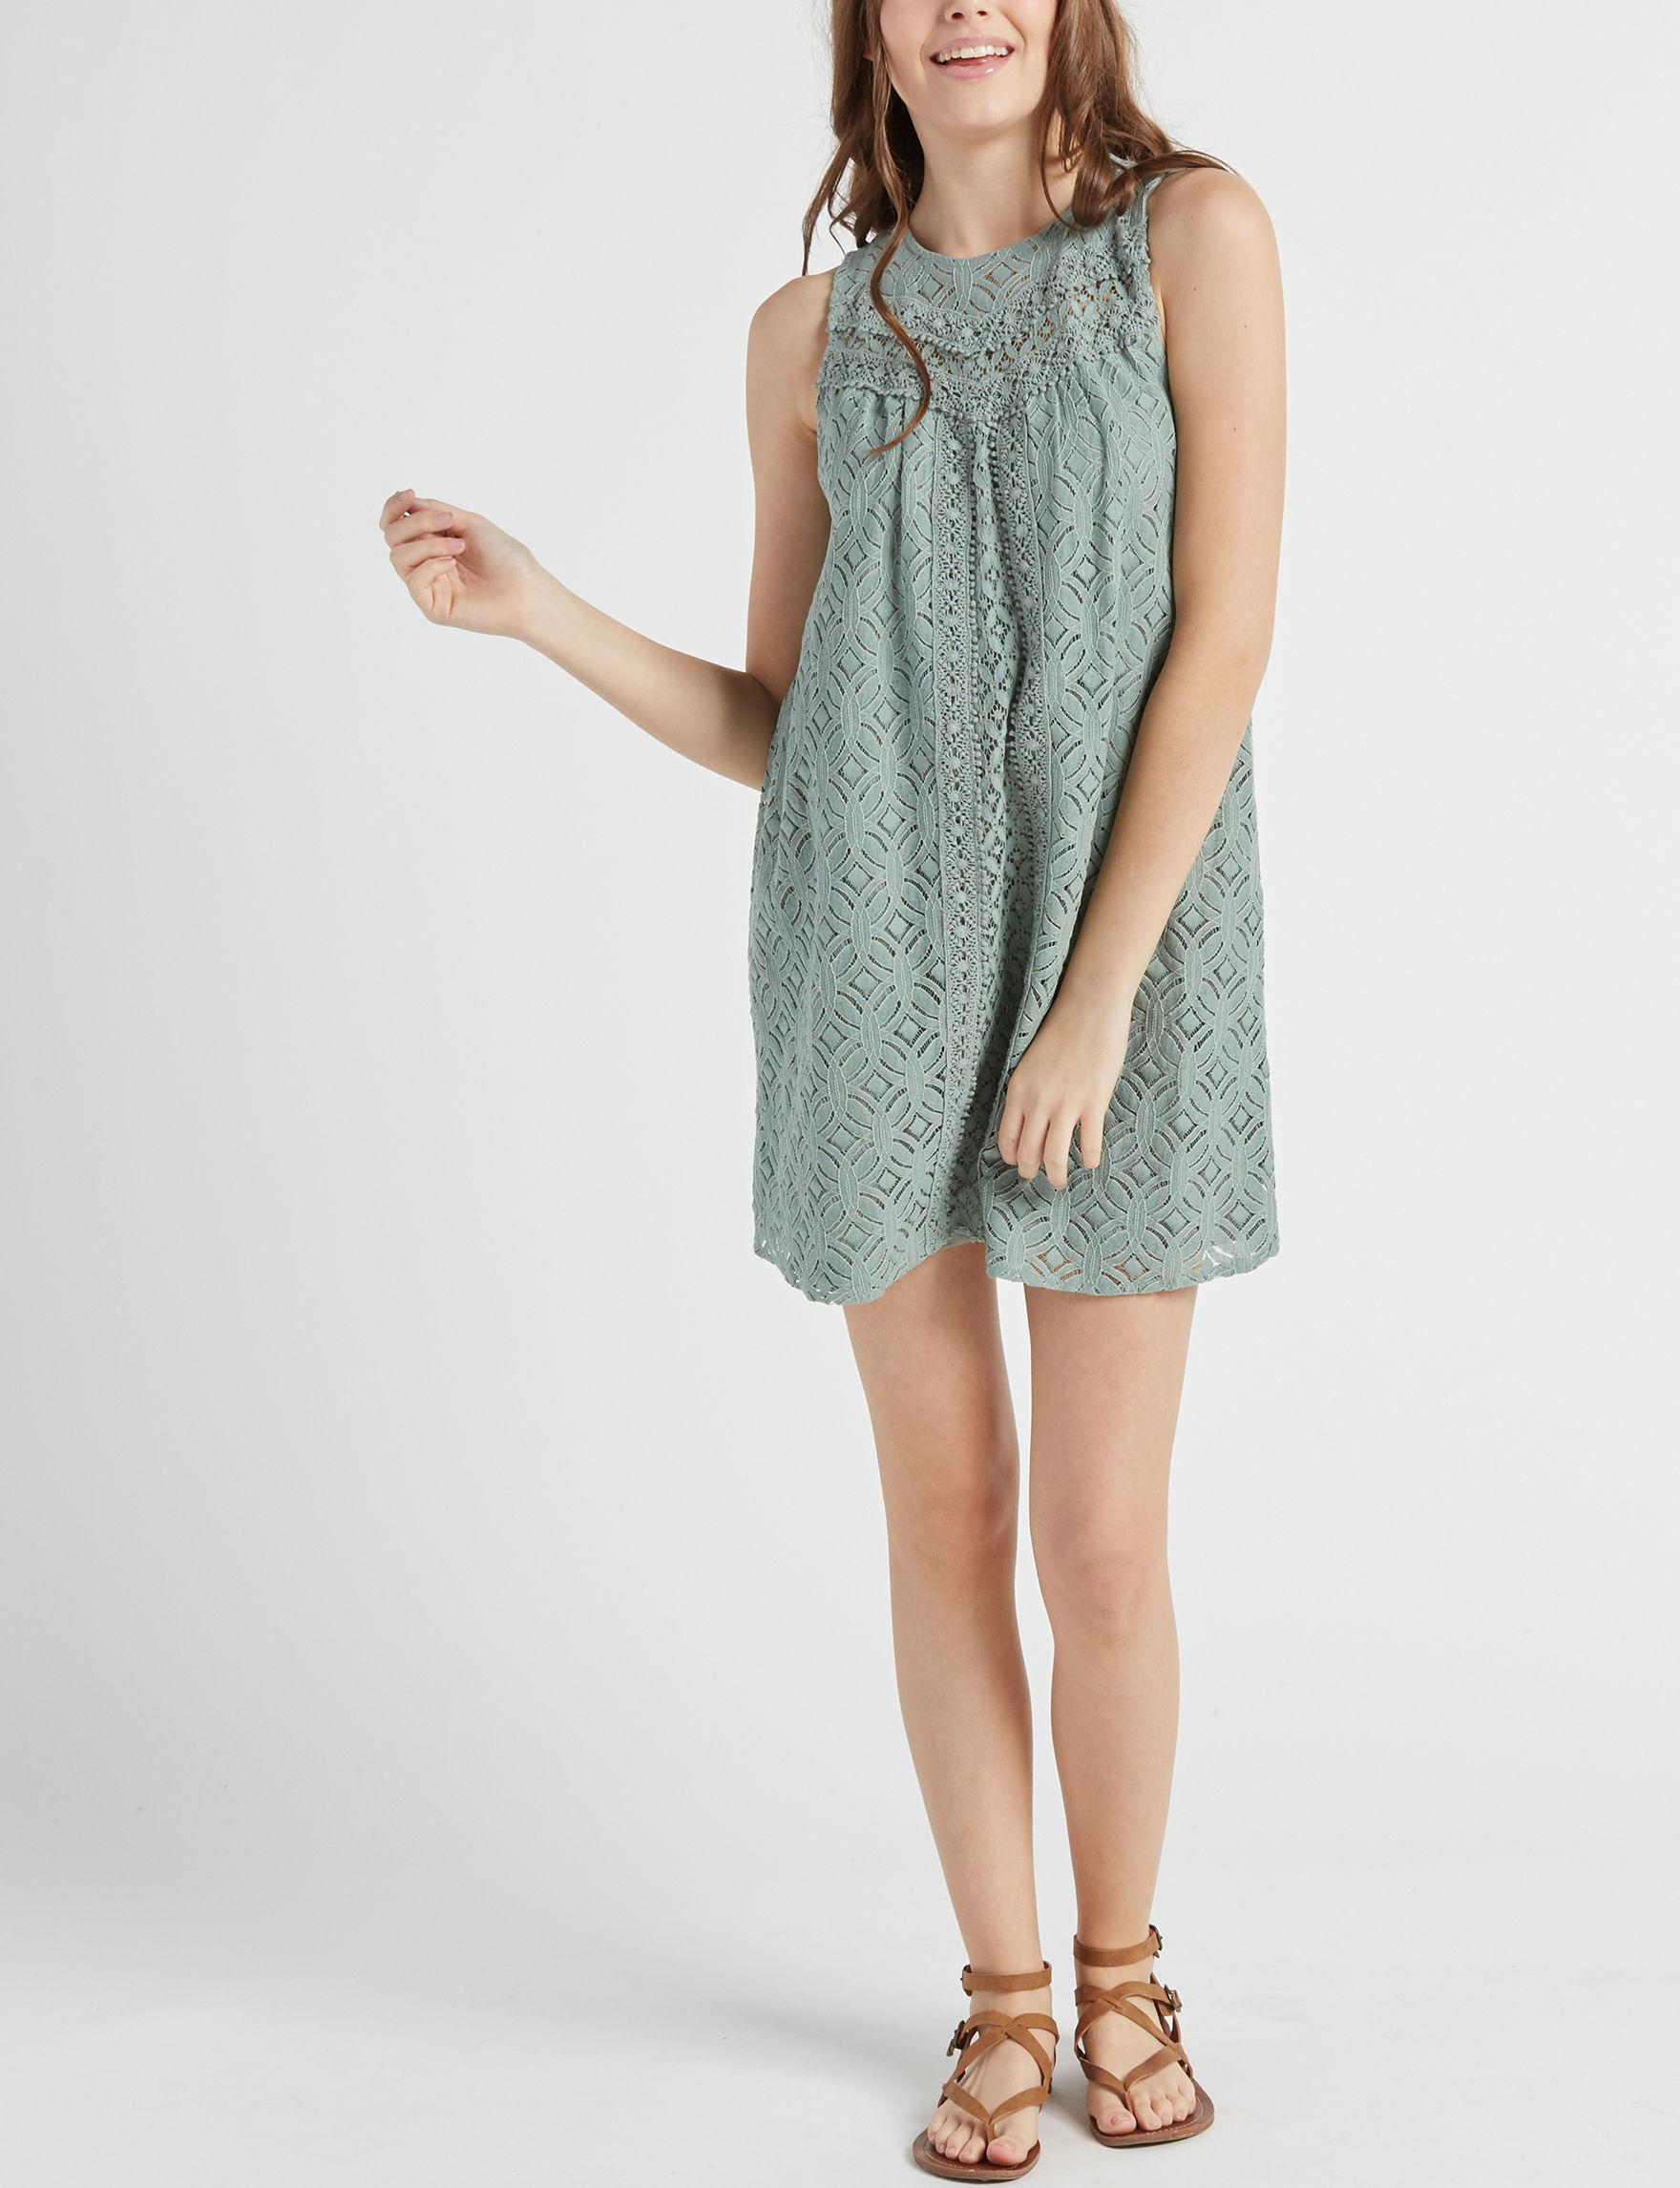 Jolt Mint Everyday & Casual Shift Dresses